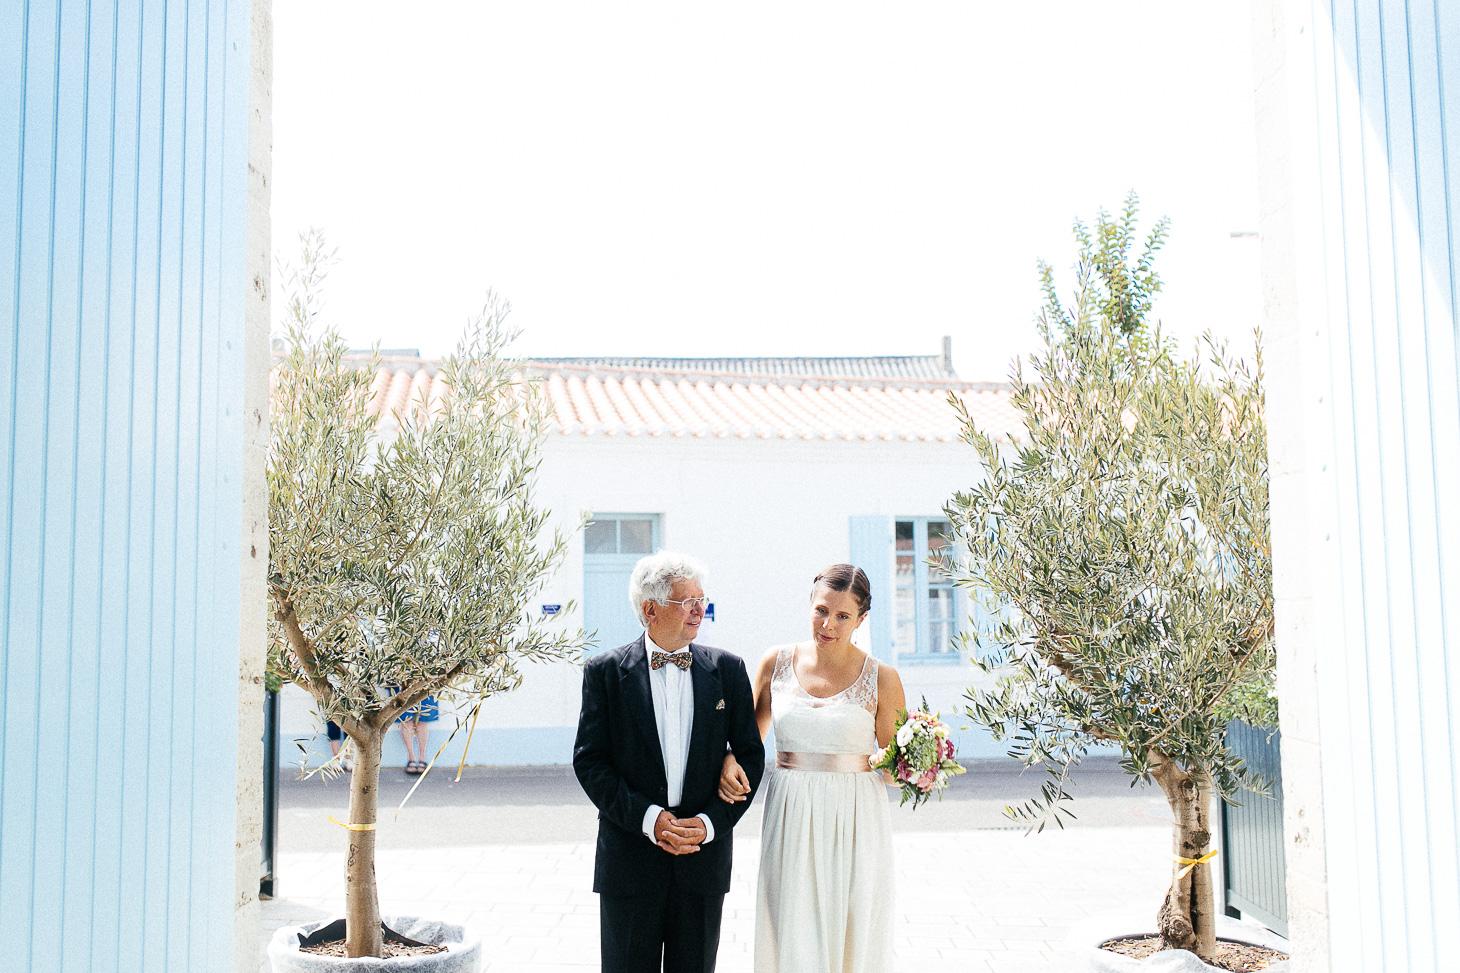 photographe-mariage-ile-d-yeu-0104